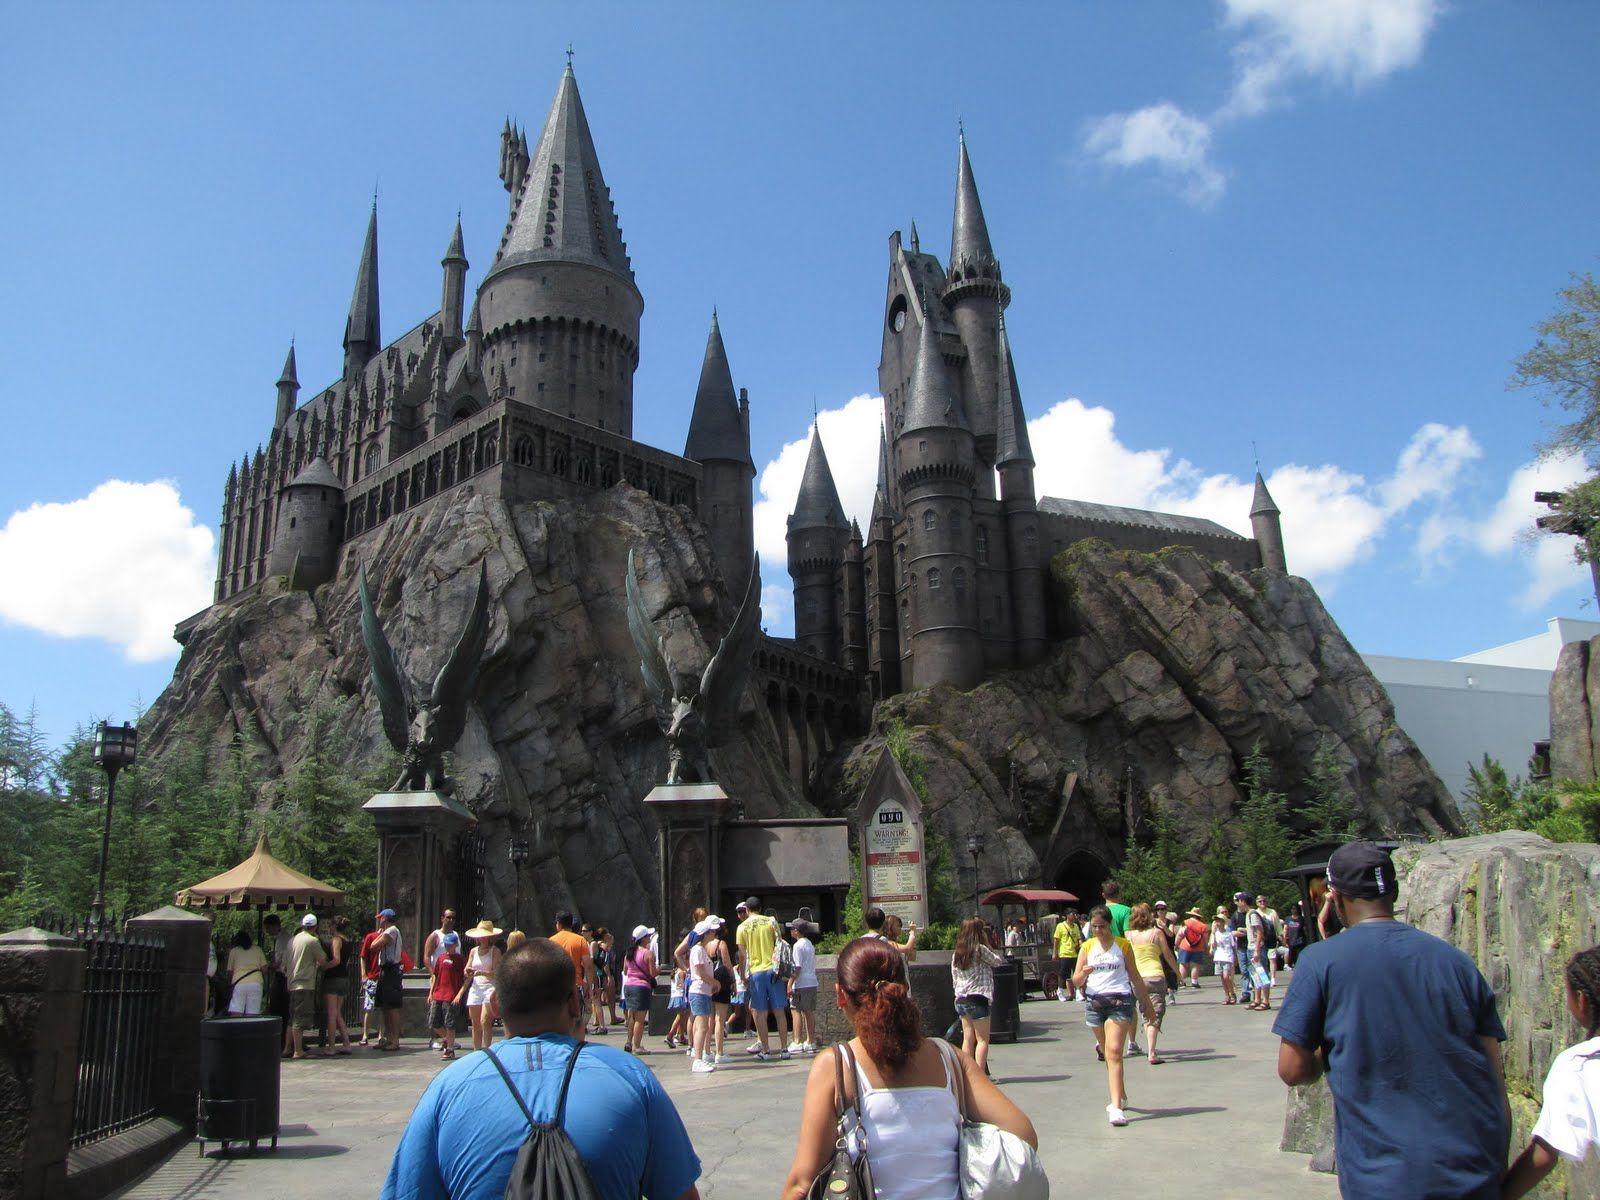 Wizarding World Of Harry Potter I Will Go There In The Near Future Wizarding World Of Harry Potter Wizarding World Harry Potter Theme Park